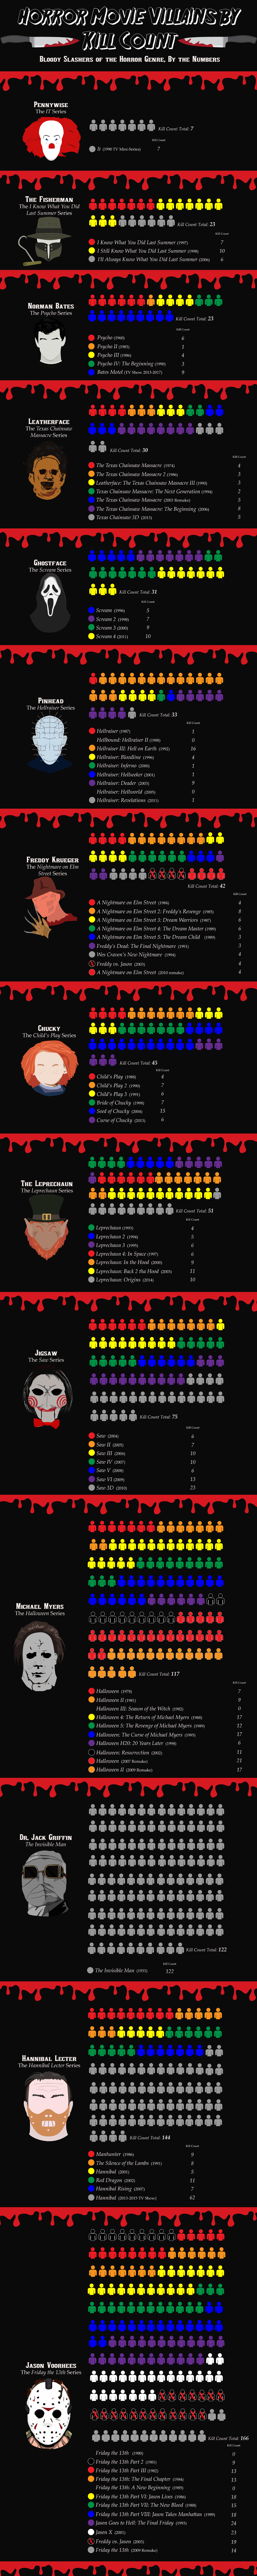 horror_movie_villains_kill_count